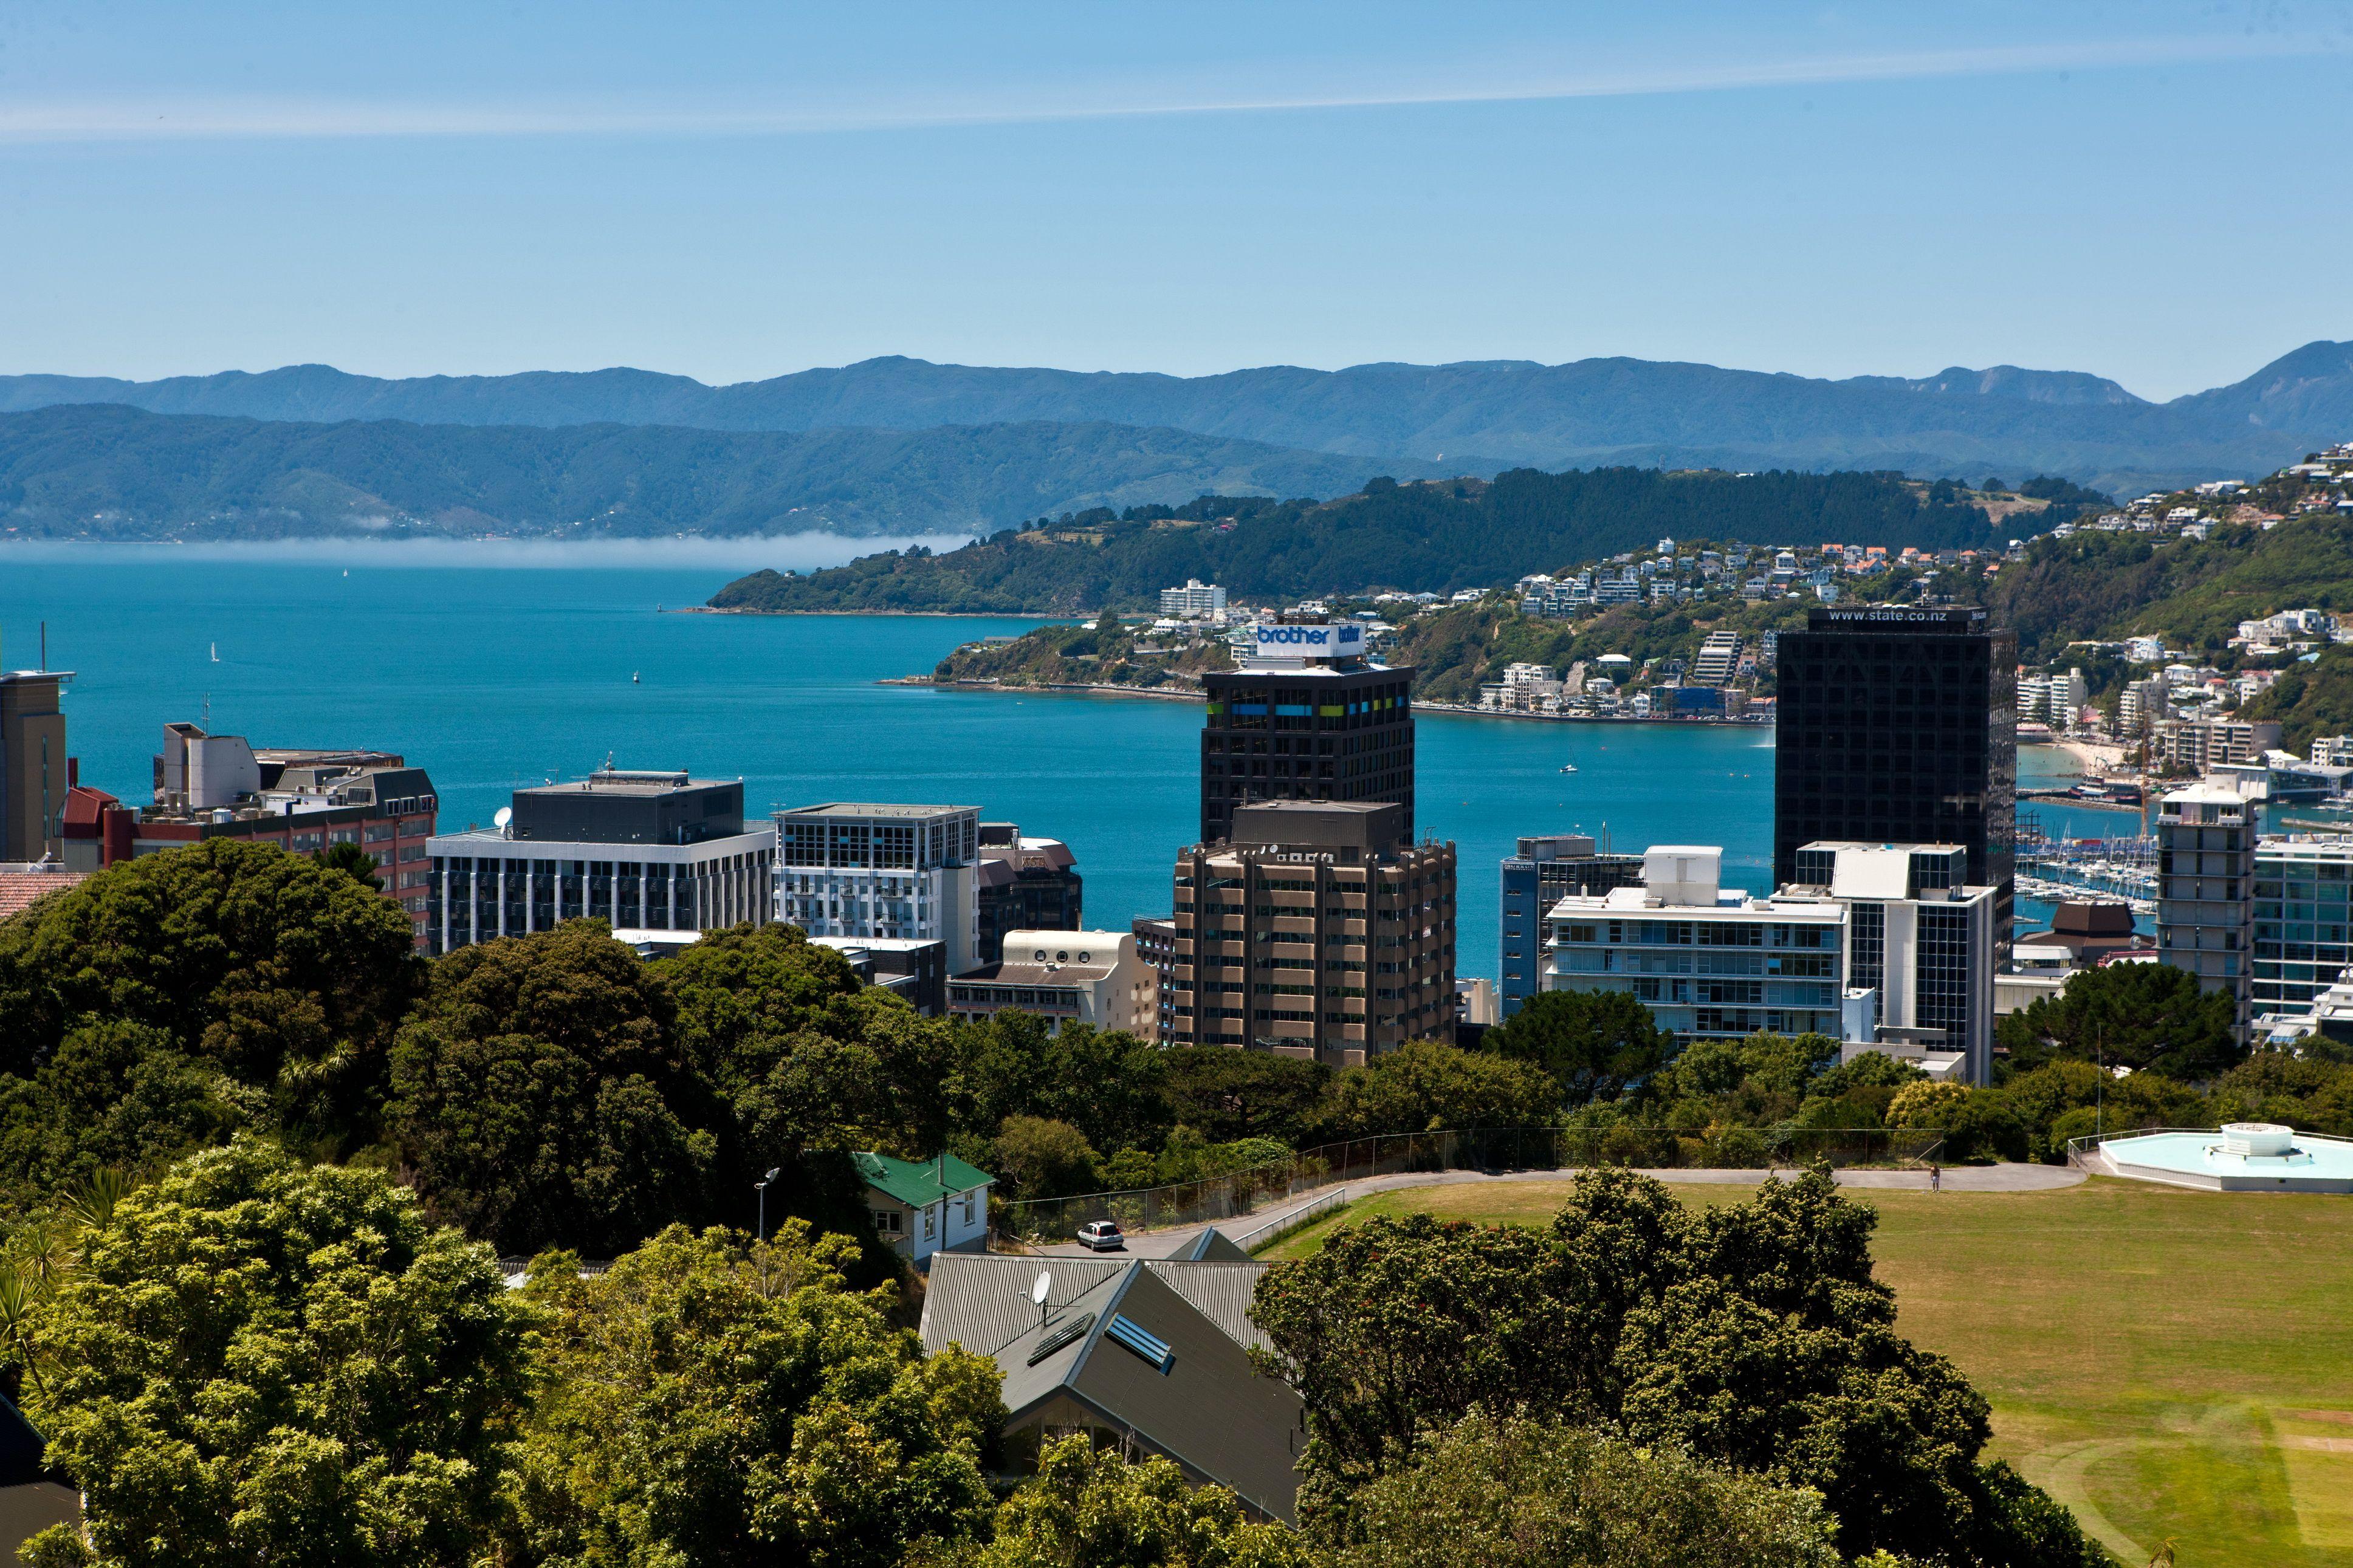 40 New Zealand Wellington Wallpapers   Download at WallpaperBro 3872x2581